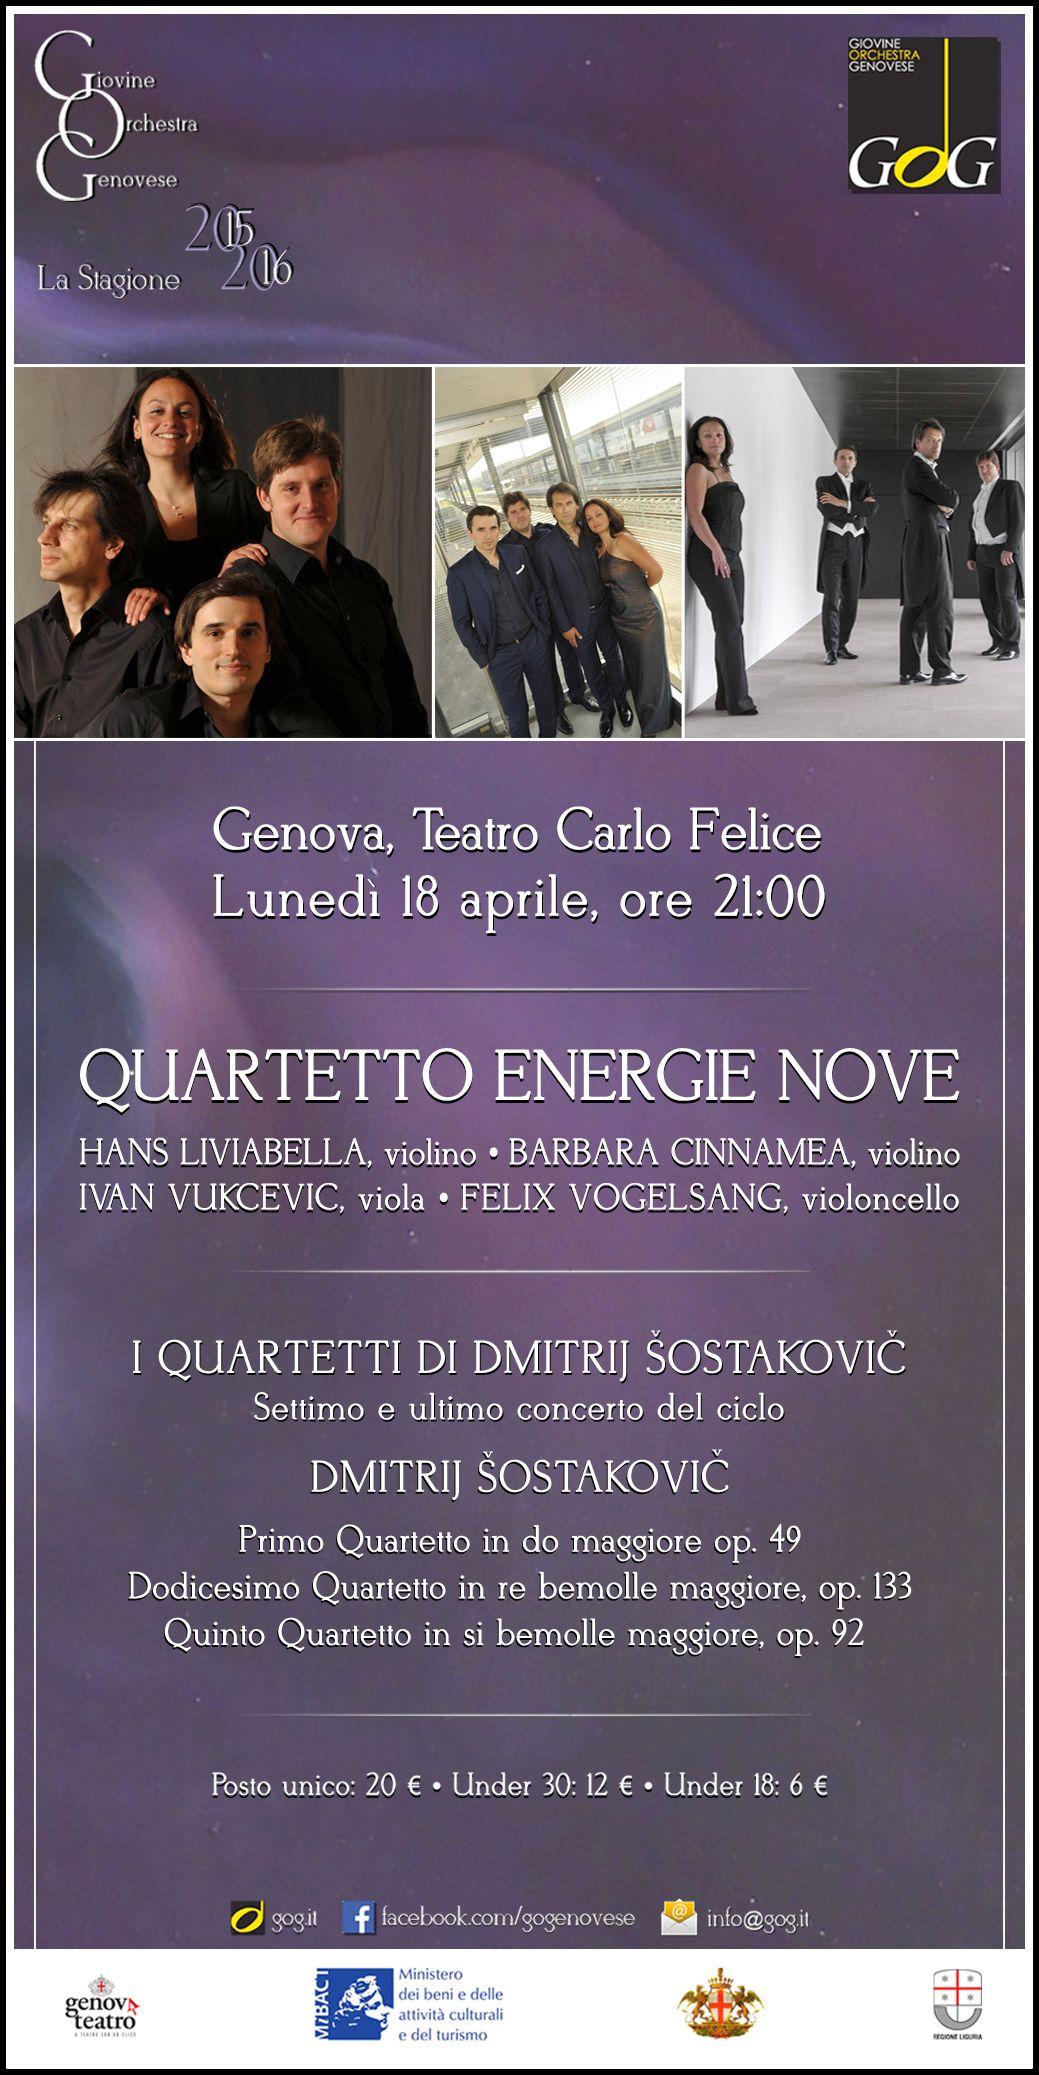 Quartetto Energie Nove | I Quartetti di Šostakovič | Lunedì 11 aprile 2016, Teatro Carlo Felice, #Genova #gog1516